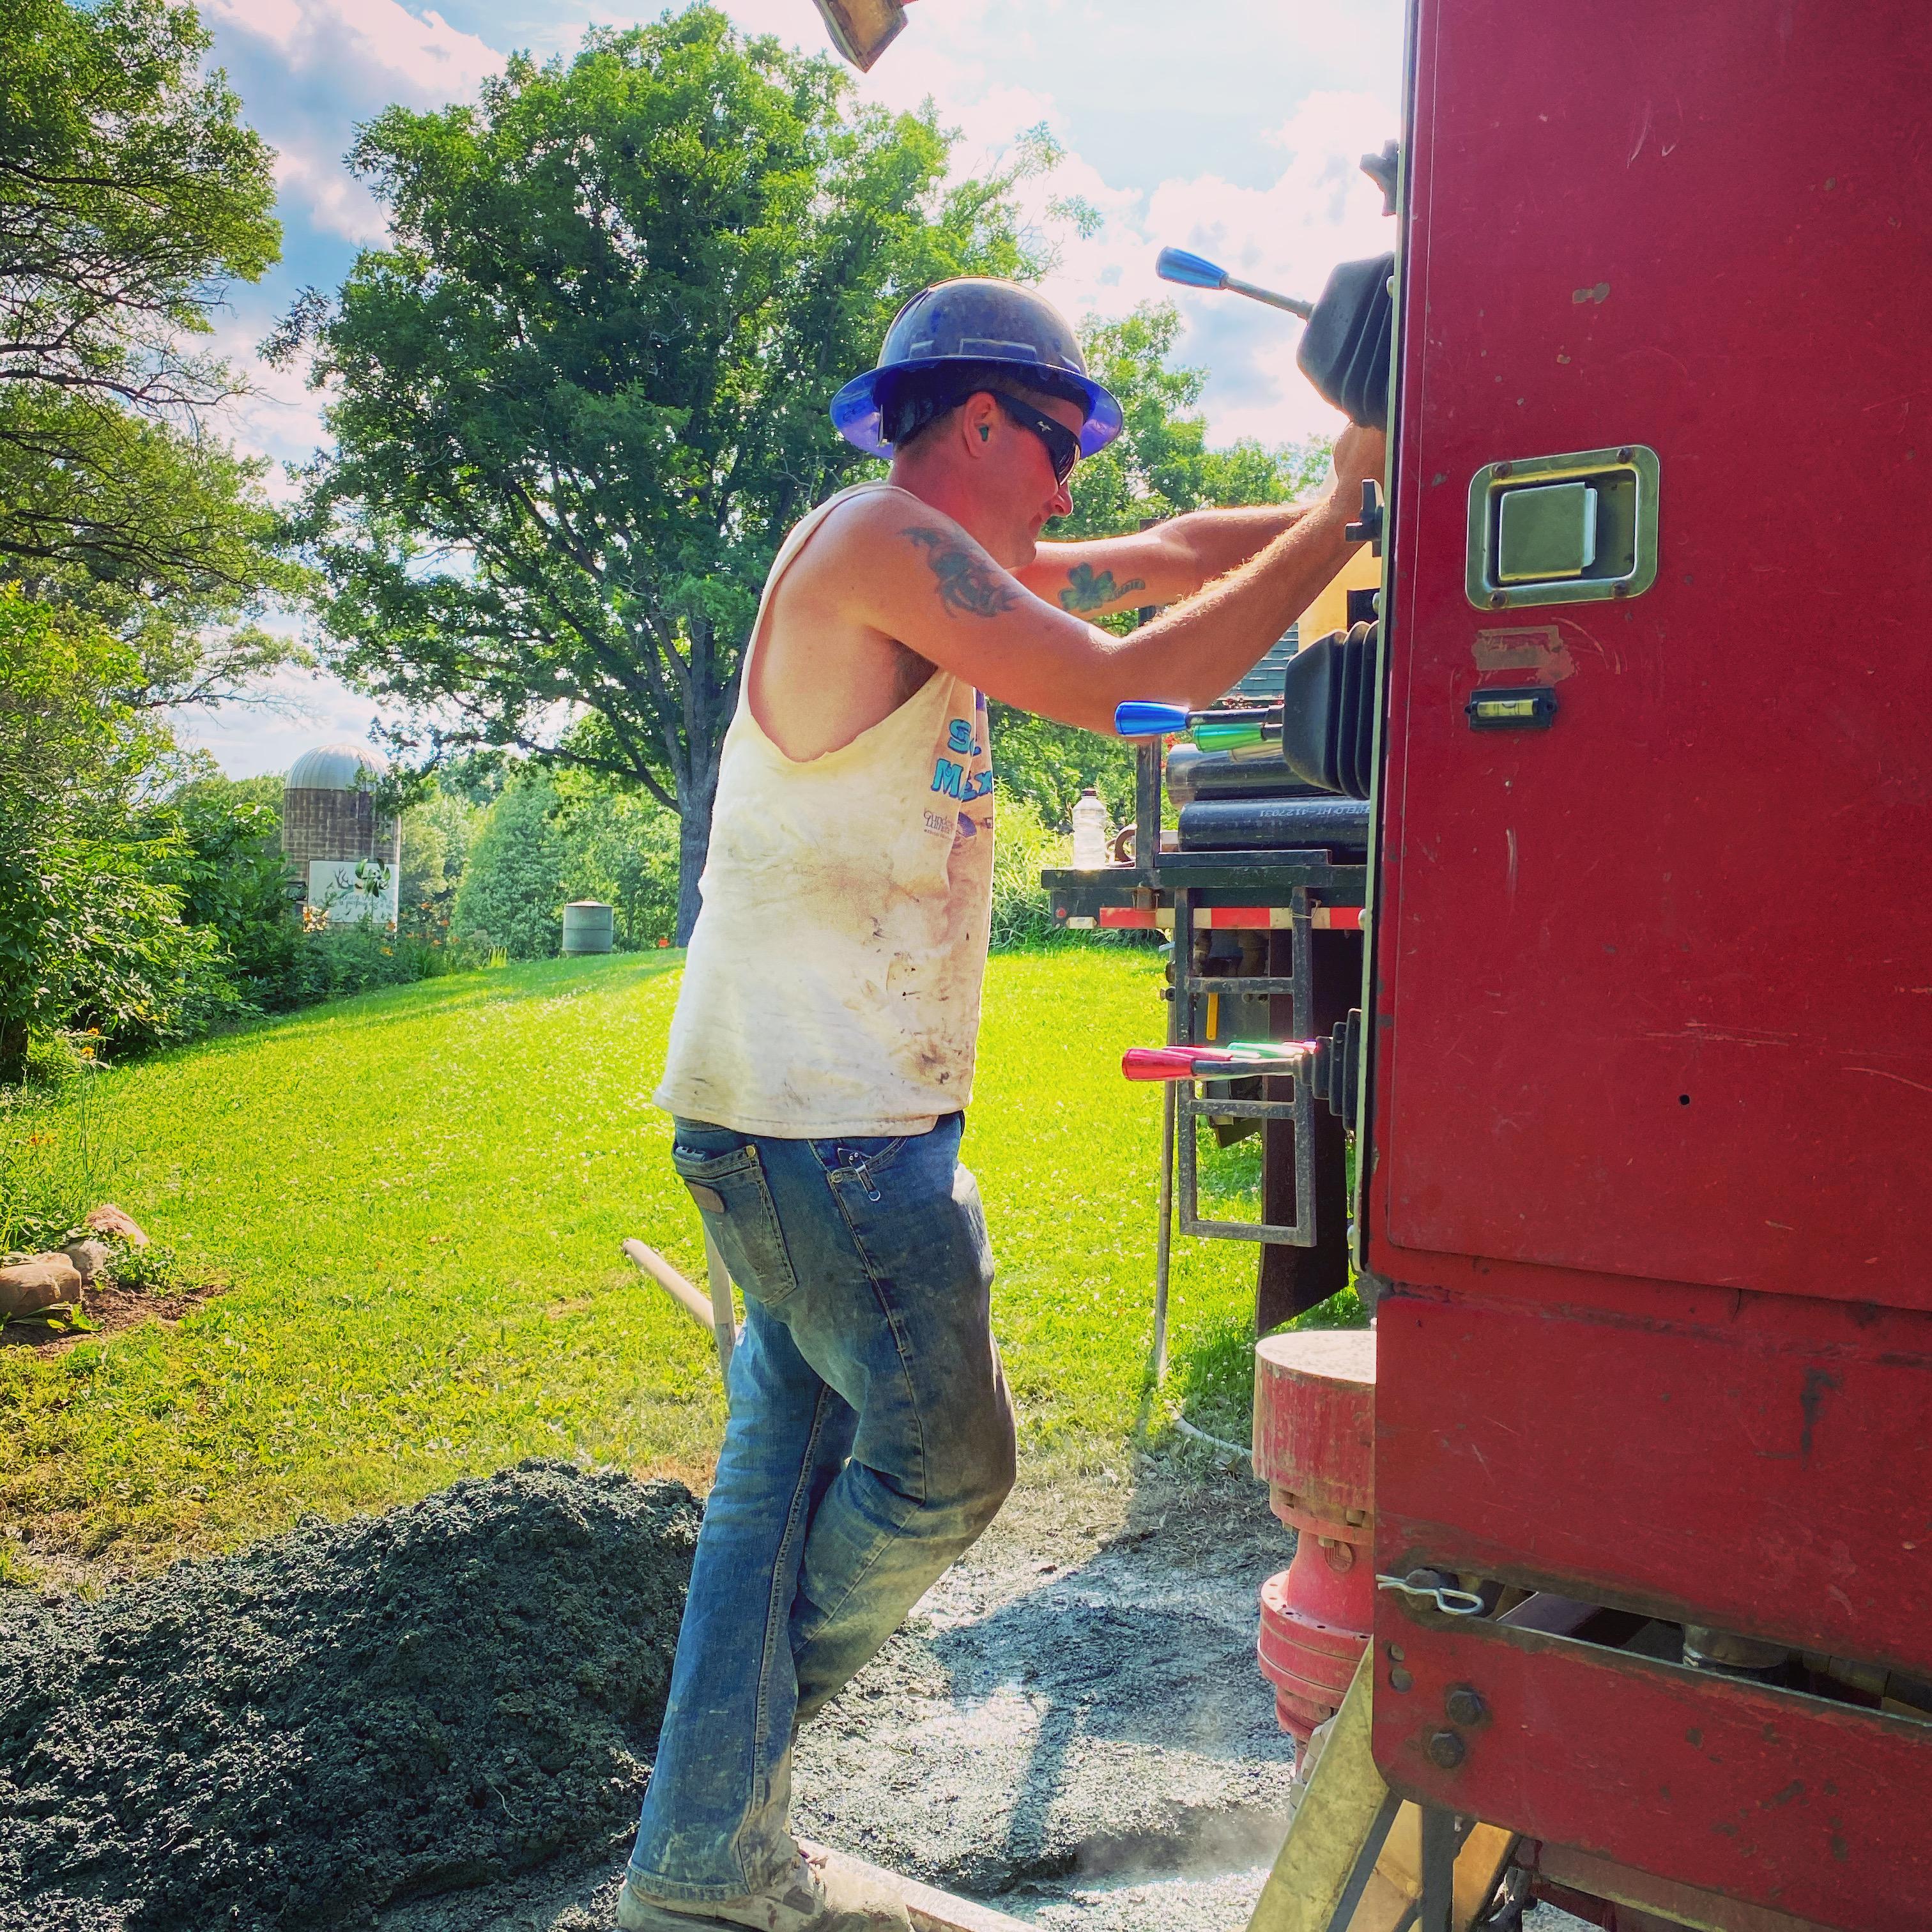 Dirty jobs